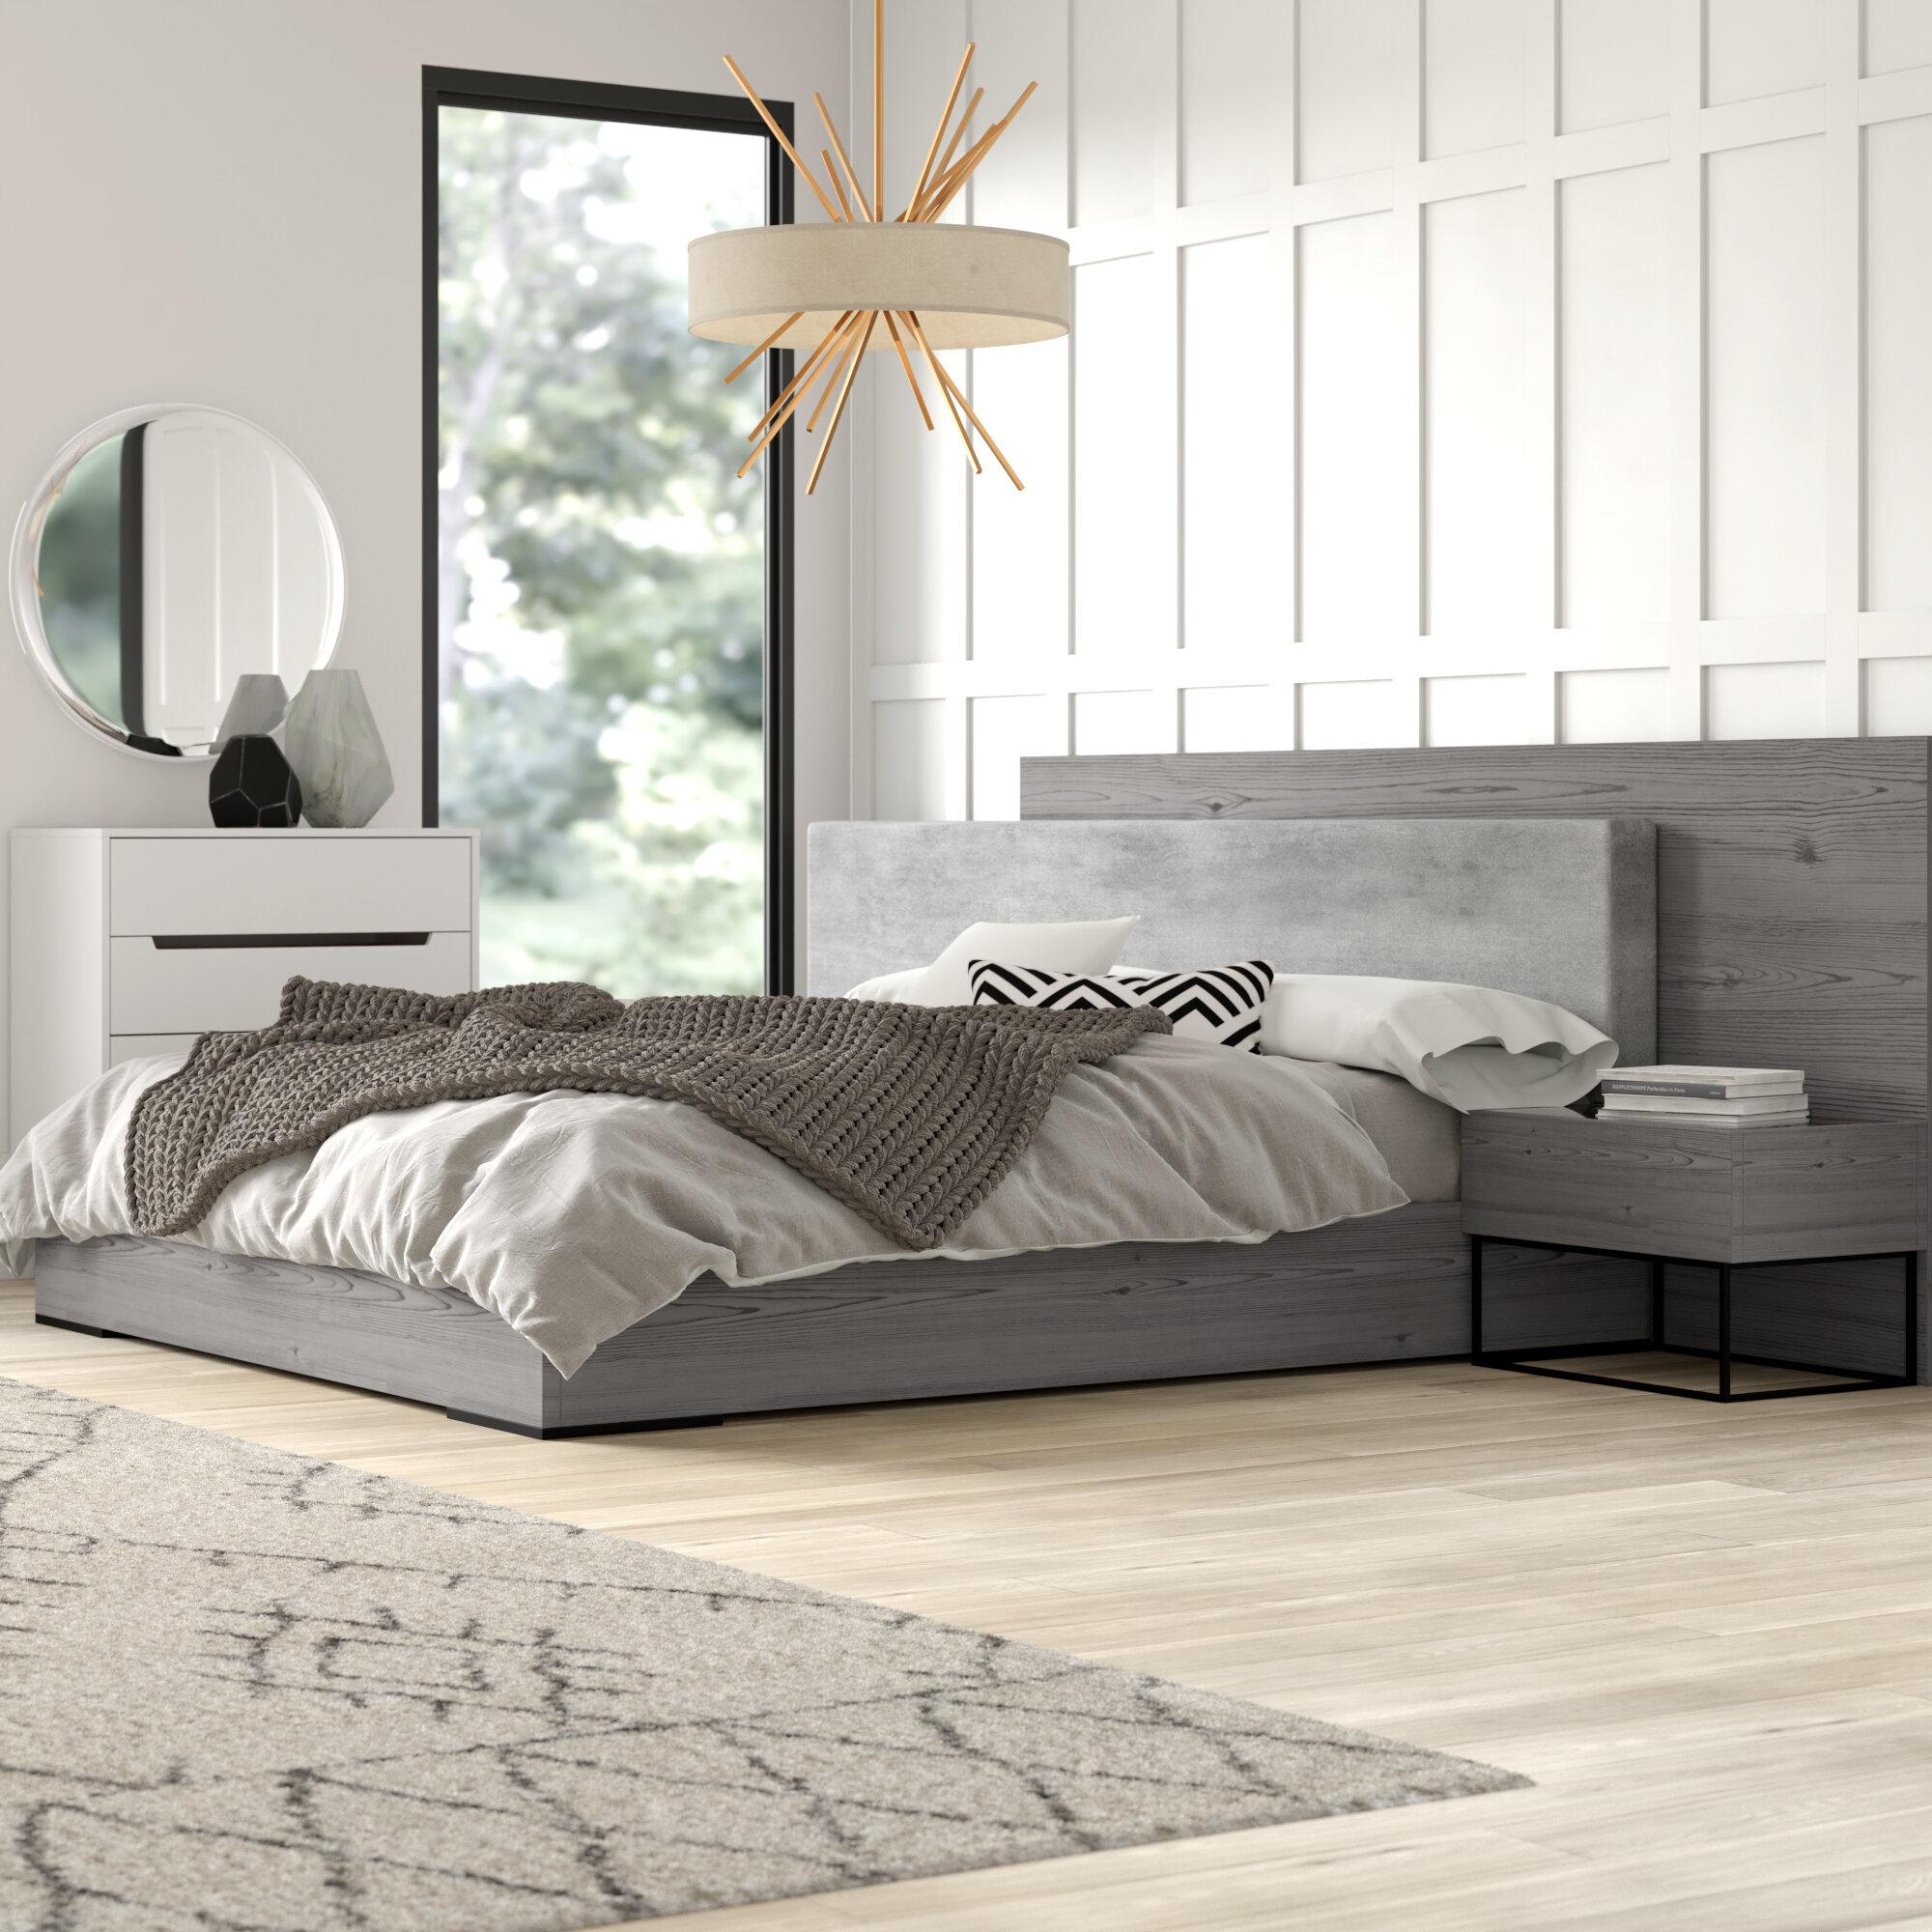 Mercury Row Mraz Upholstered Platform 3 Piece Bedroom Set